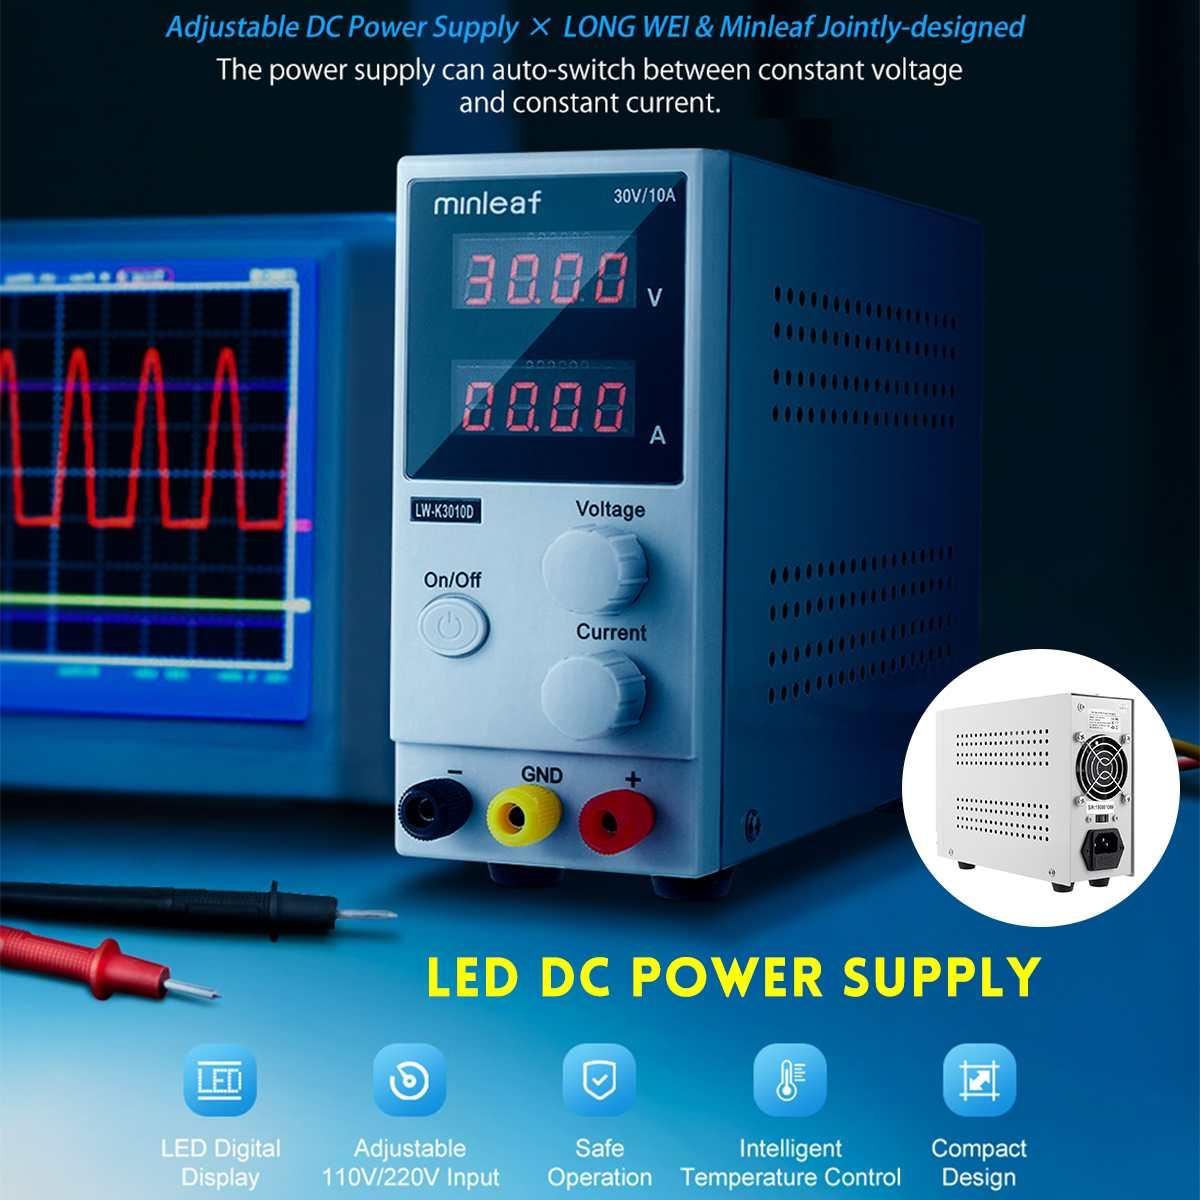 Mini Adjustable LED Display DC Power Supply 30V 10A Laboratory Switching Regulator Power Supply Laptop Phone Repair Rework Tools